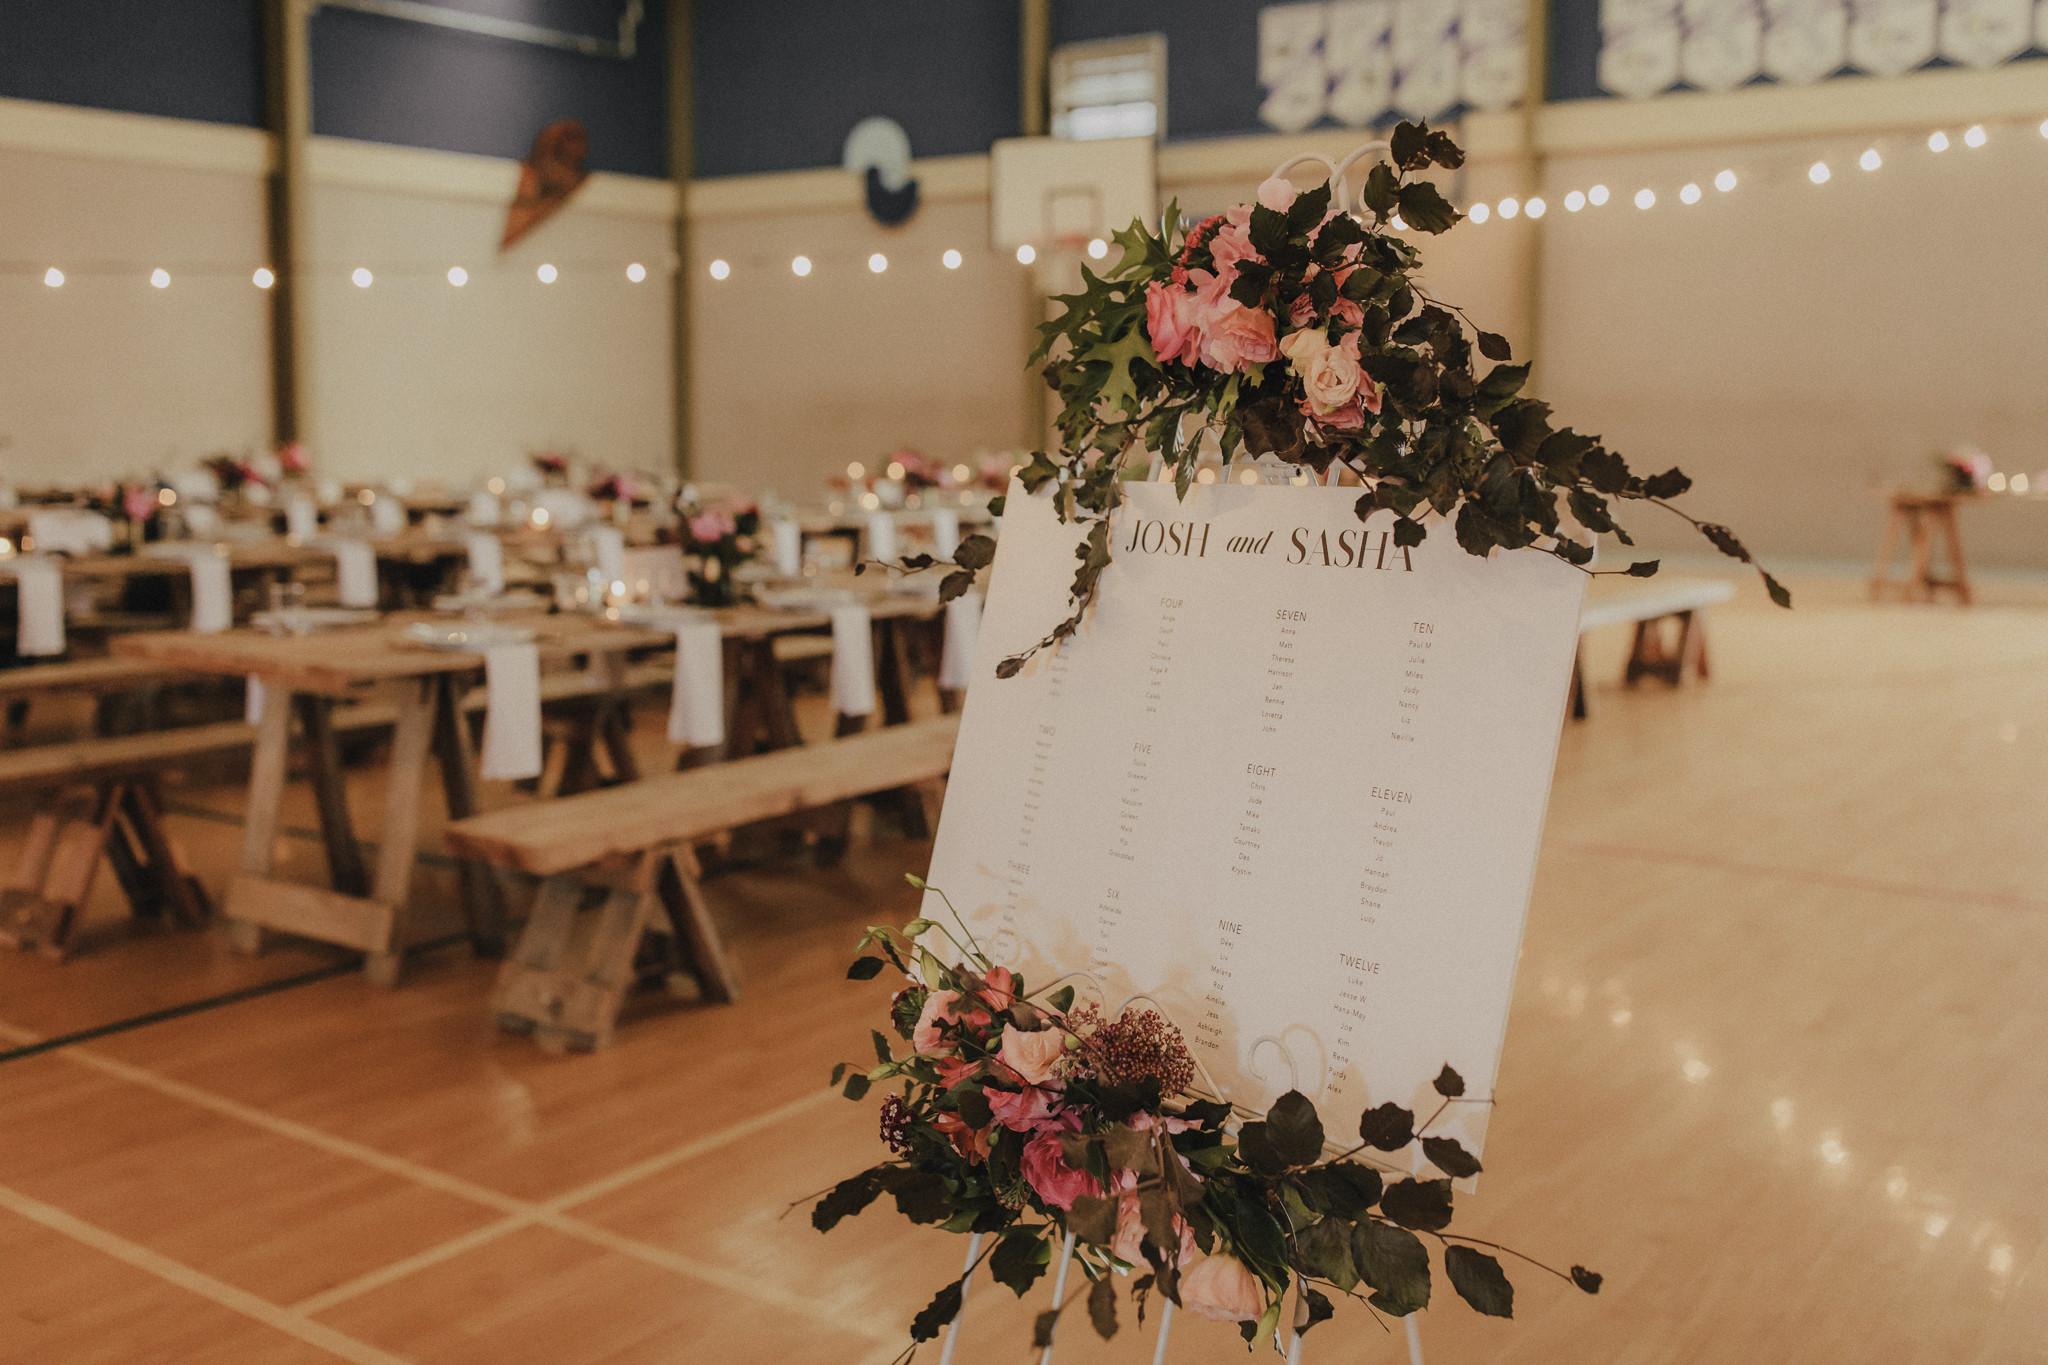 On My Hand Florist - Real wedding portfolio - Sasha and Josh - wedding reception seating chart flower decoration